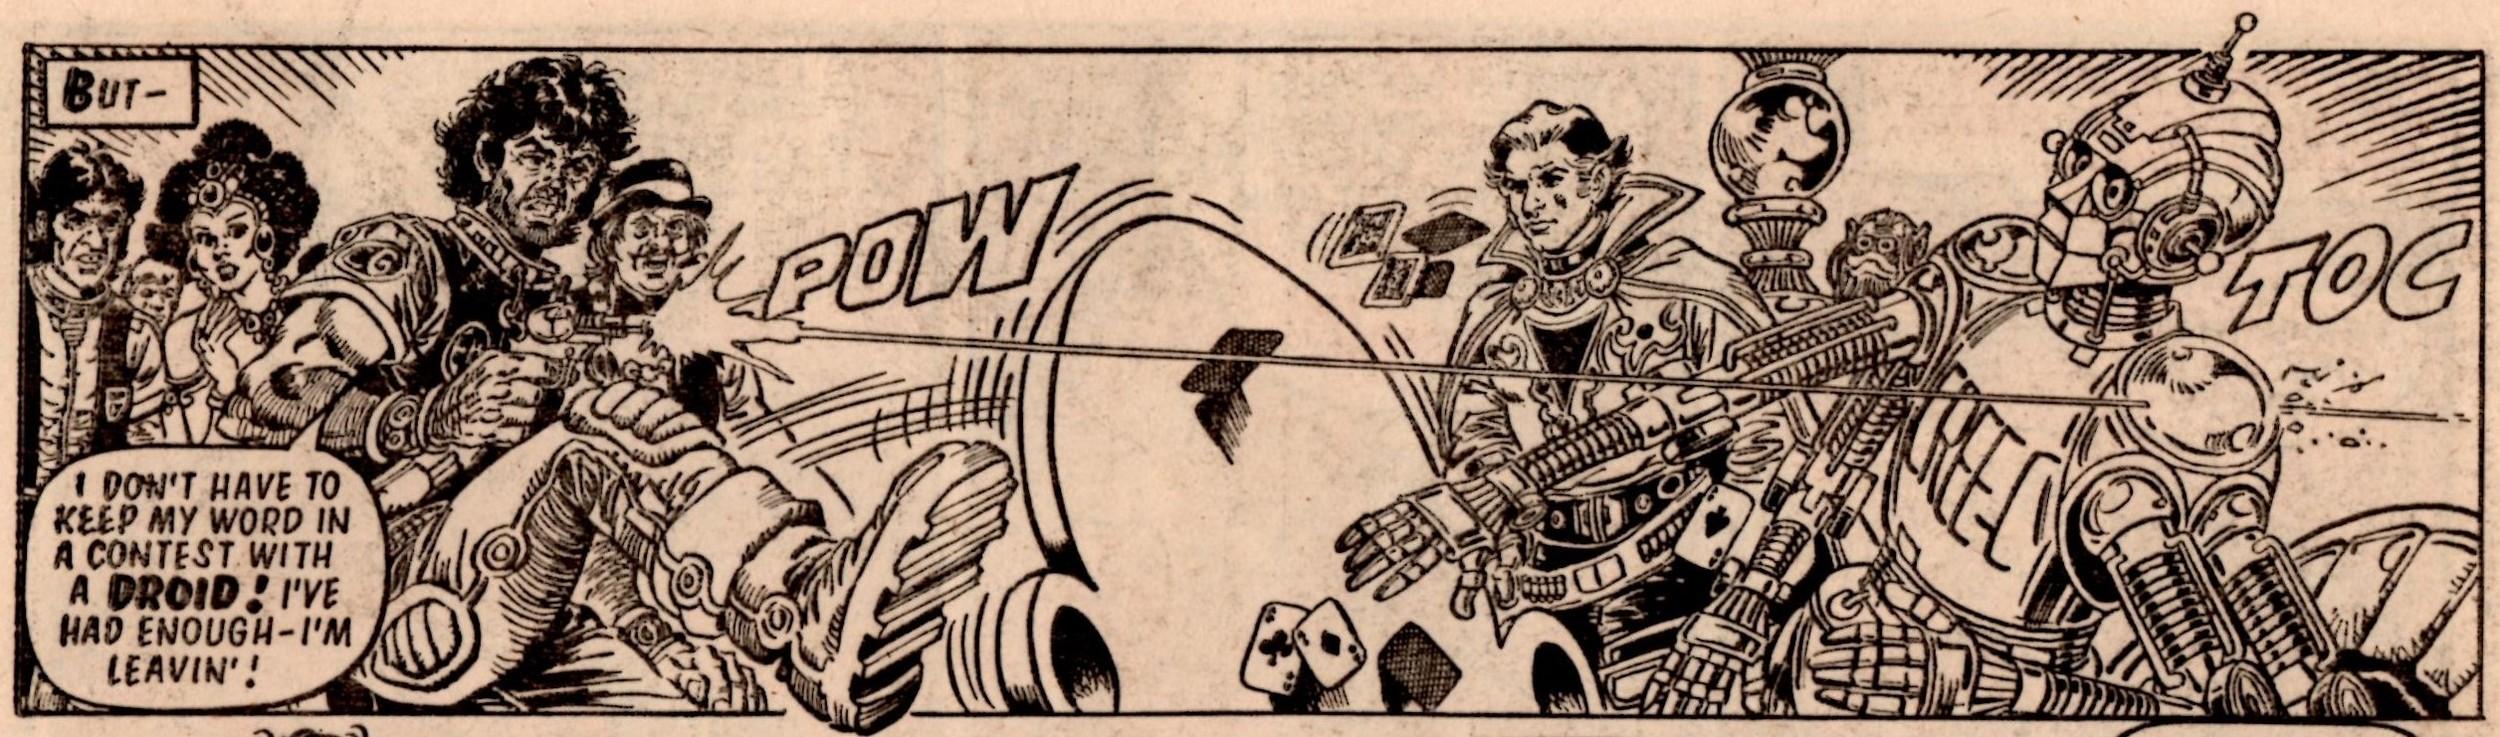 Ro-jaws' Robo-tales: It's a Knockout: Oleh (writer), Jose Casanovas (artist)